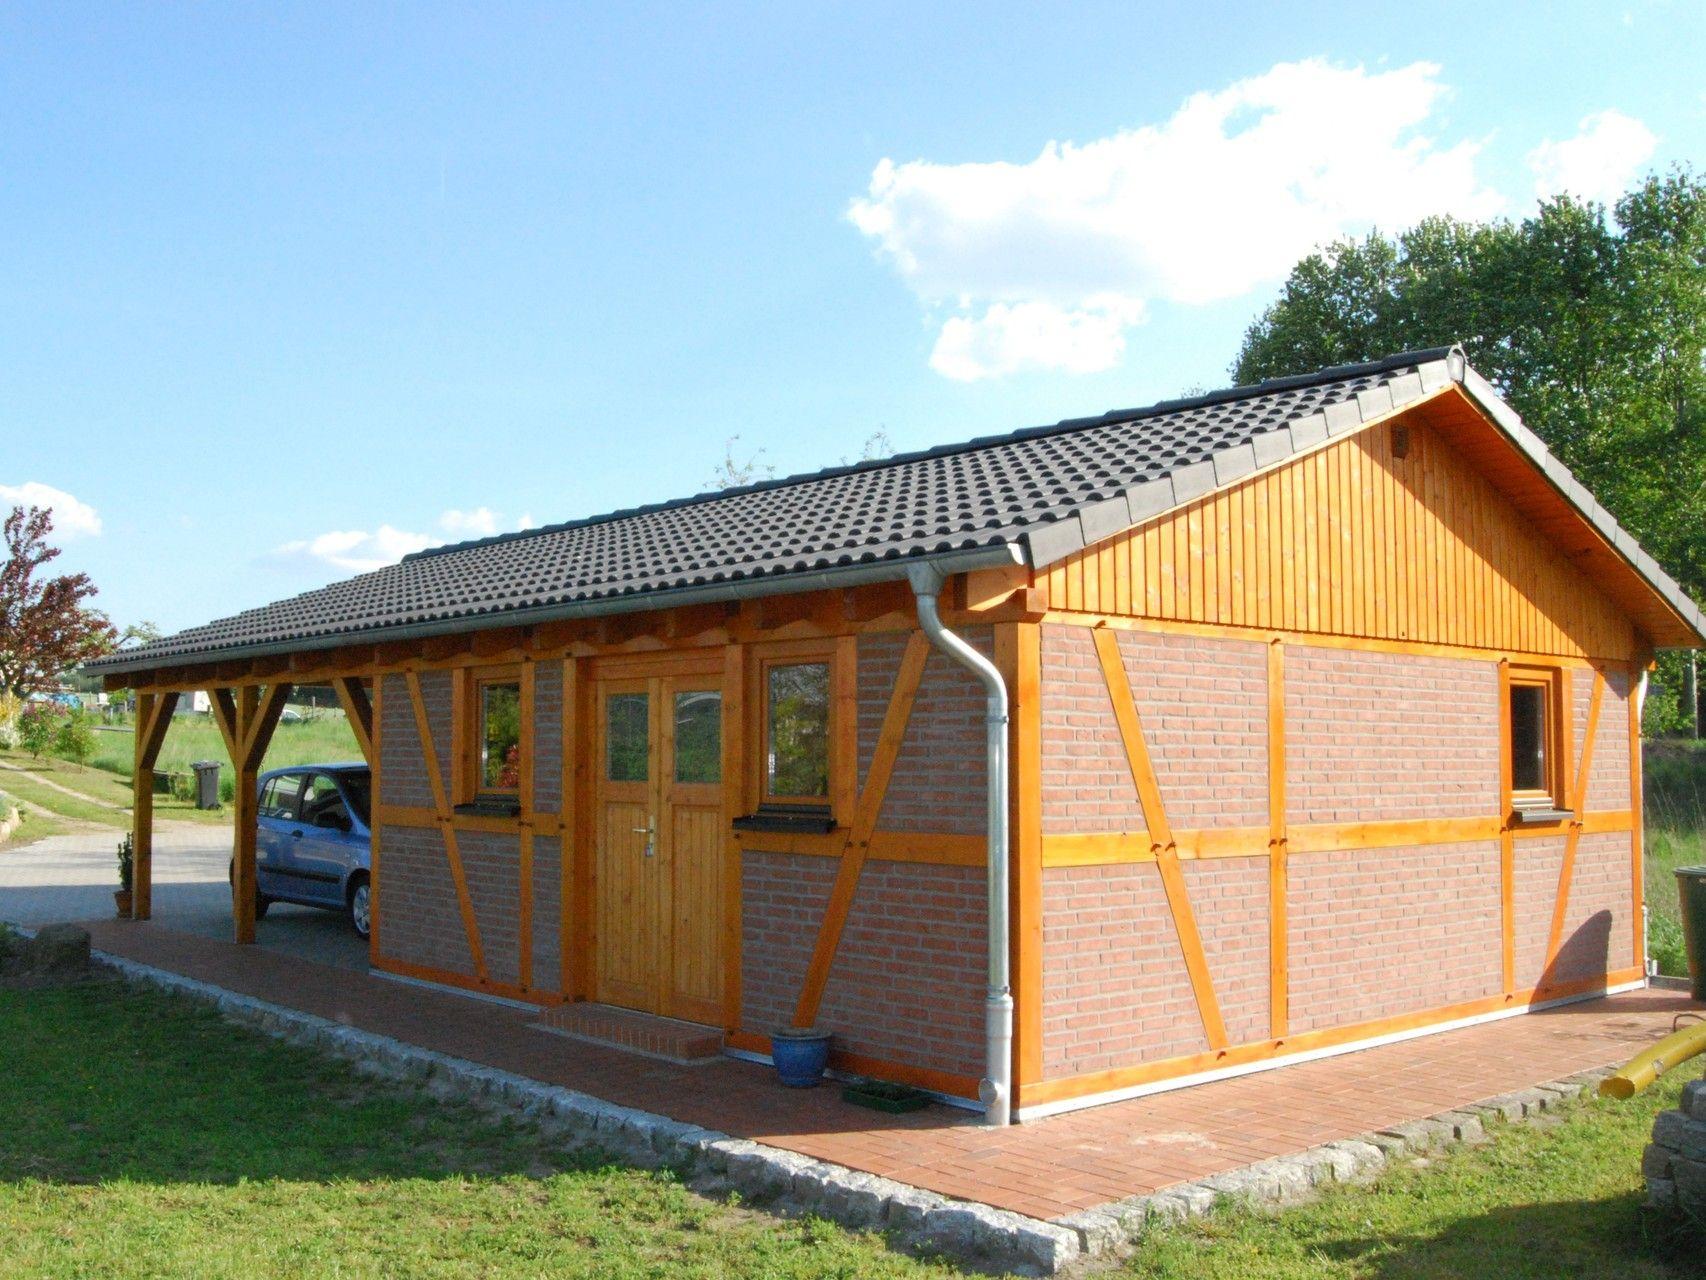 42 Spitzdach Carport Galerie Carport Mit Schuppen Dach